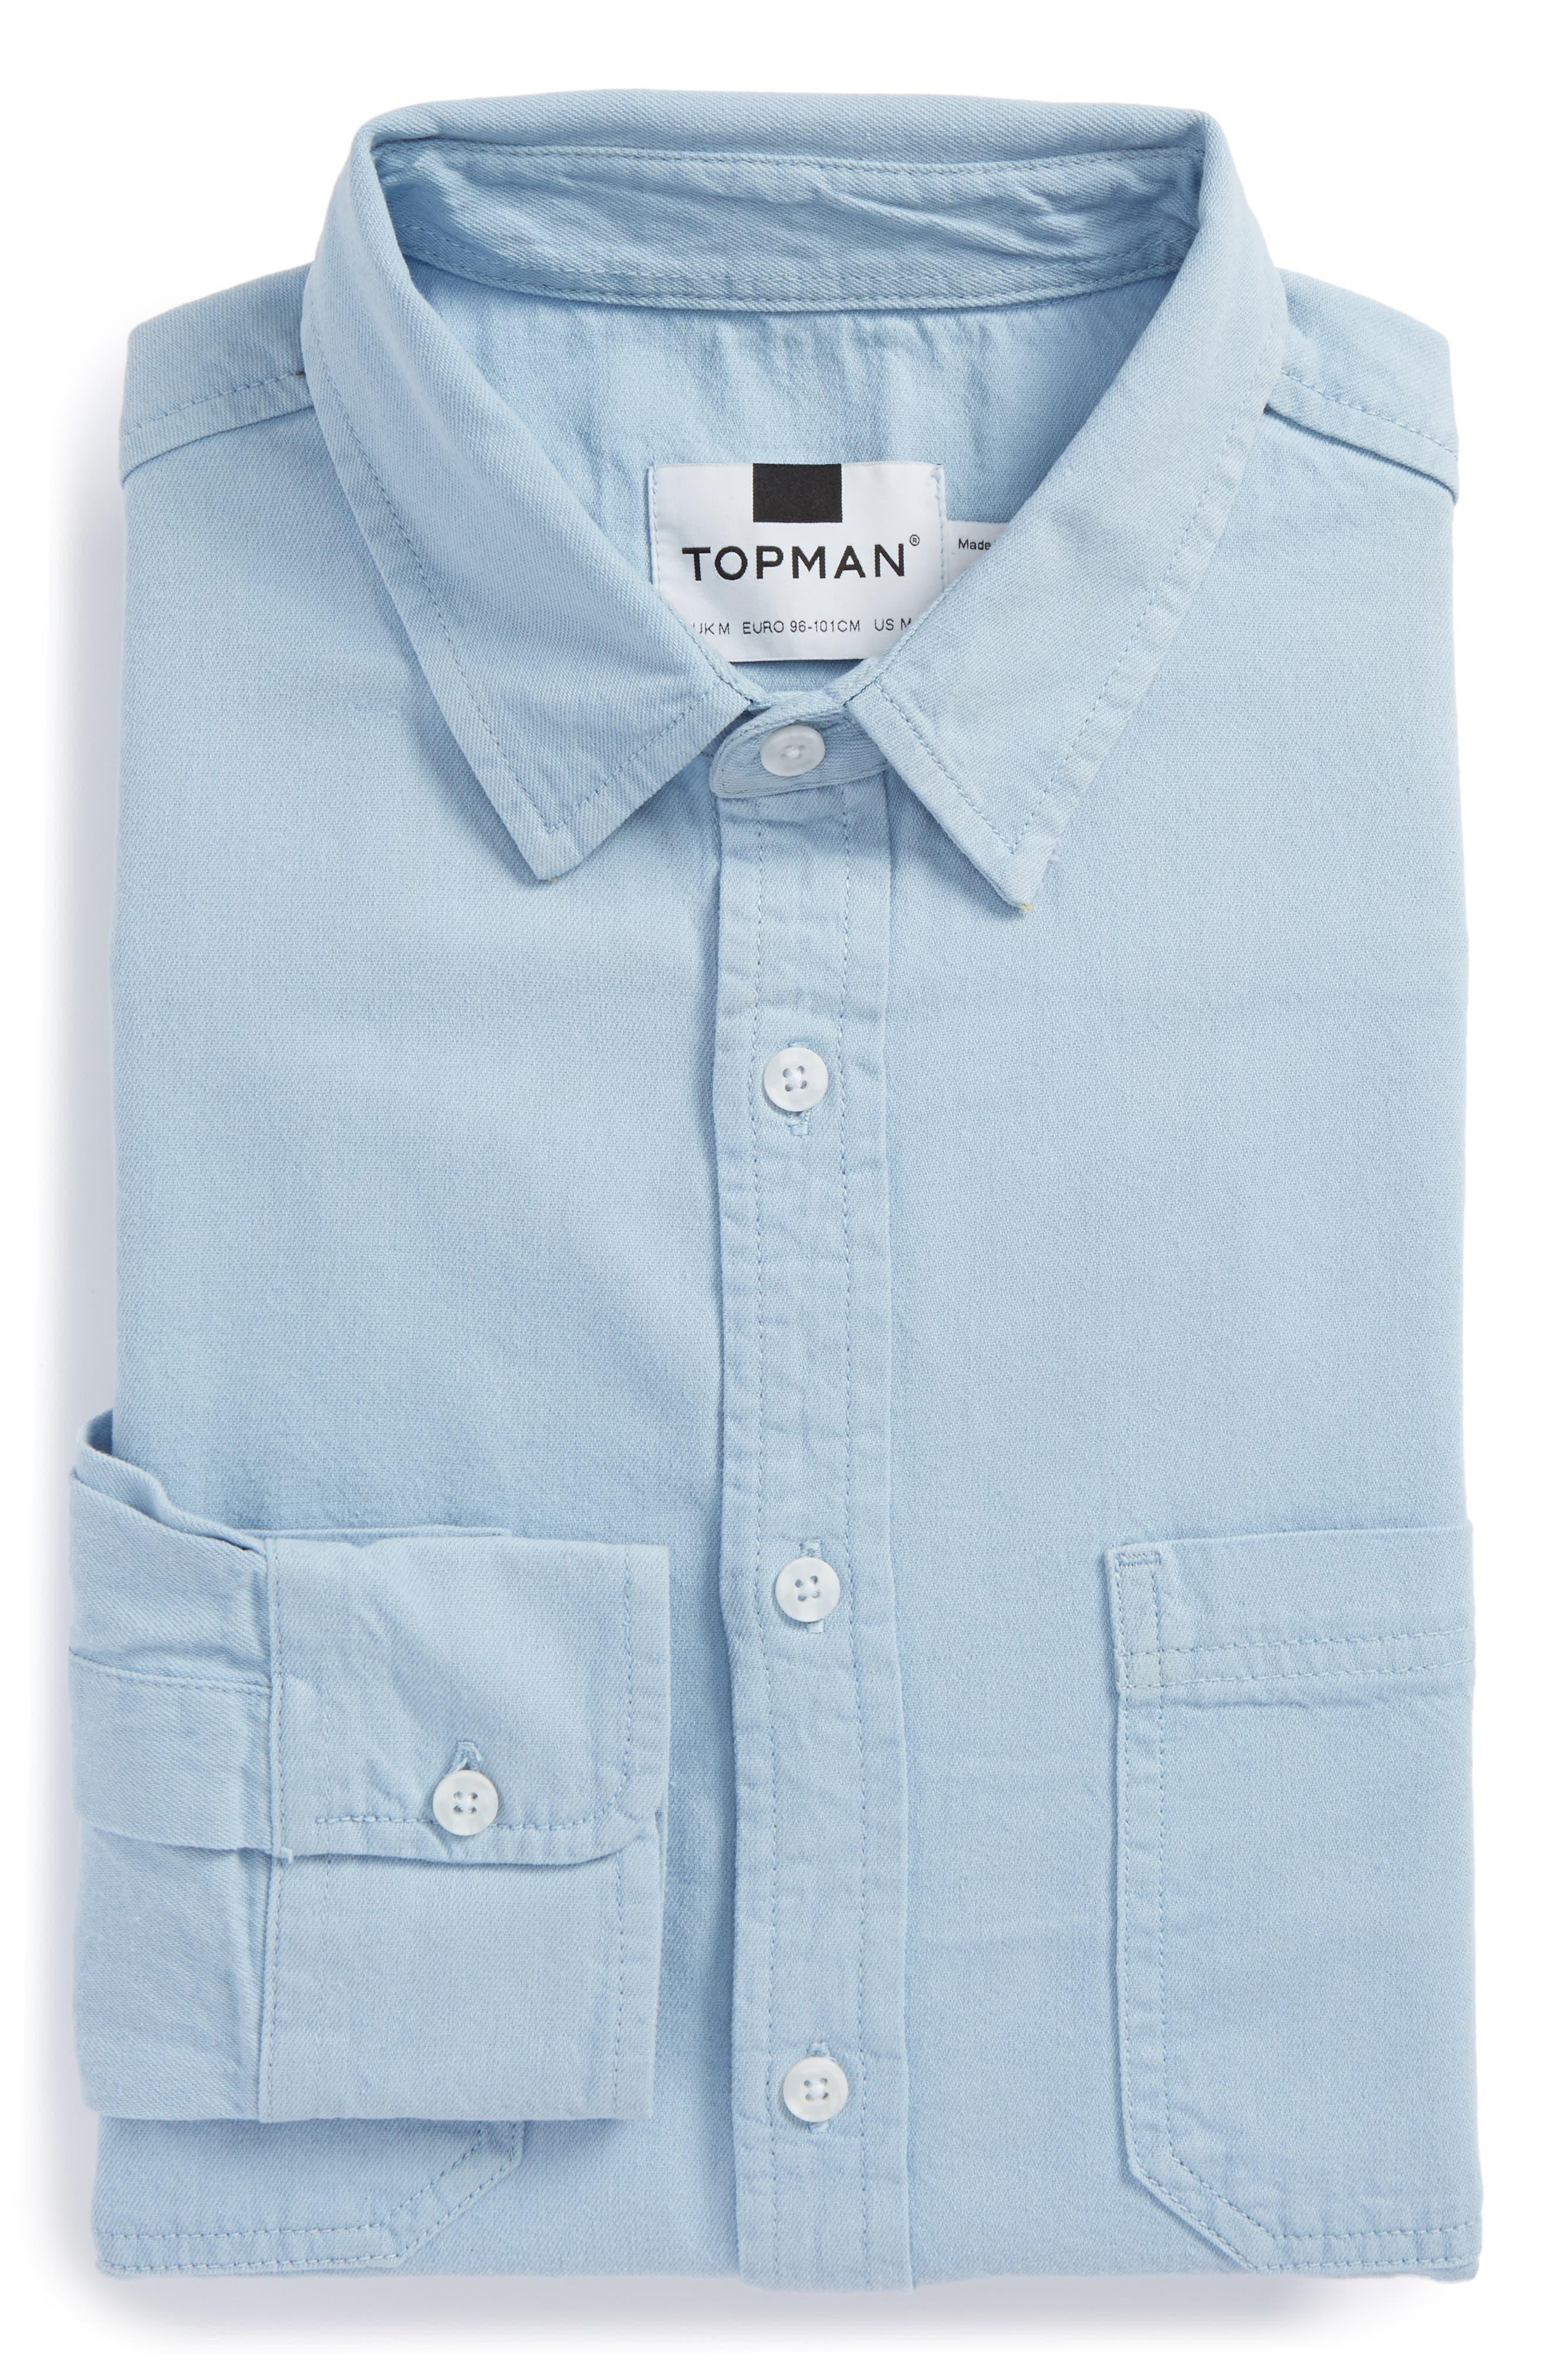 Topman Washed Twill Shirt